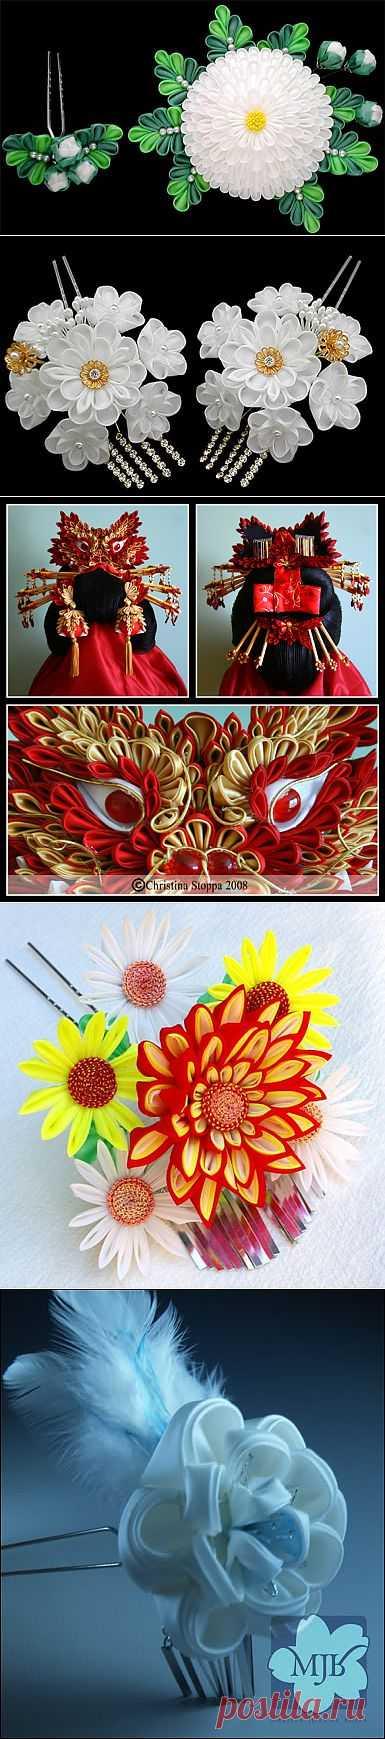 Красота канзаши 2. | Золотые Руки